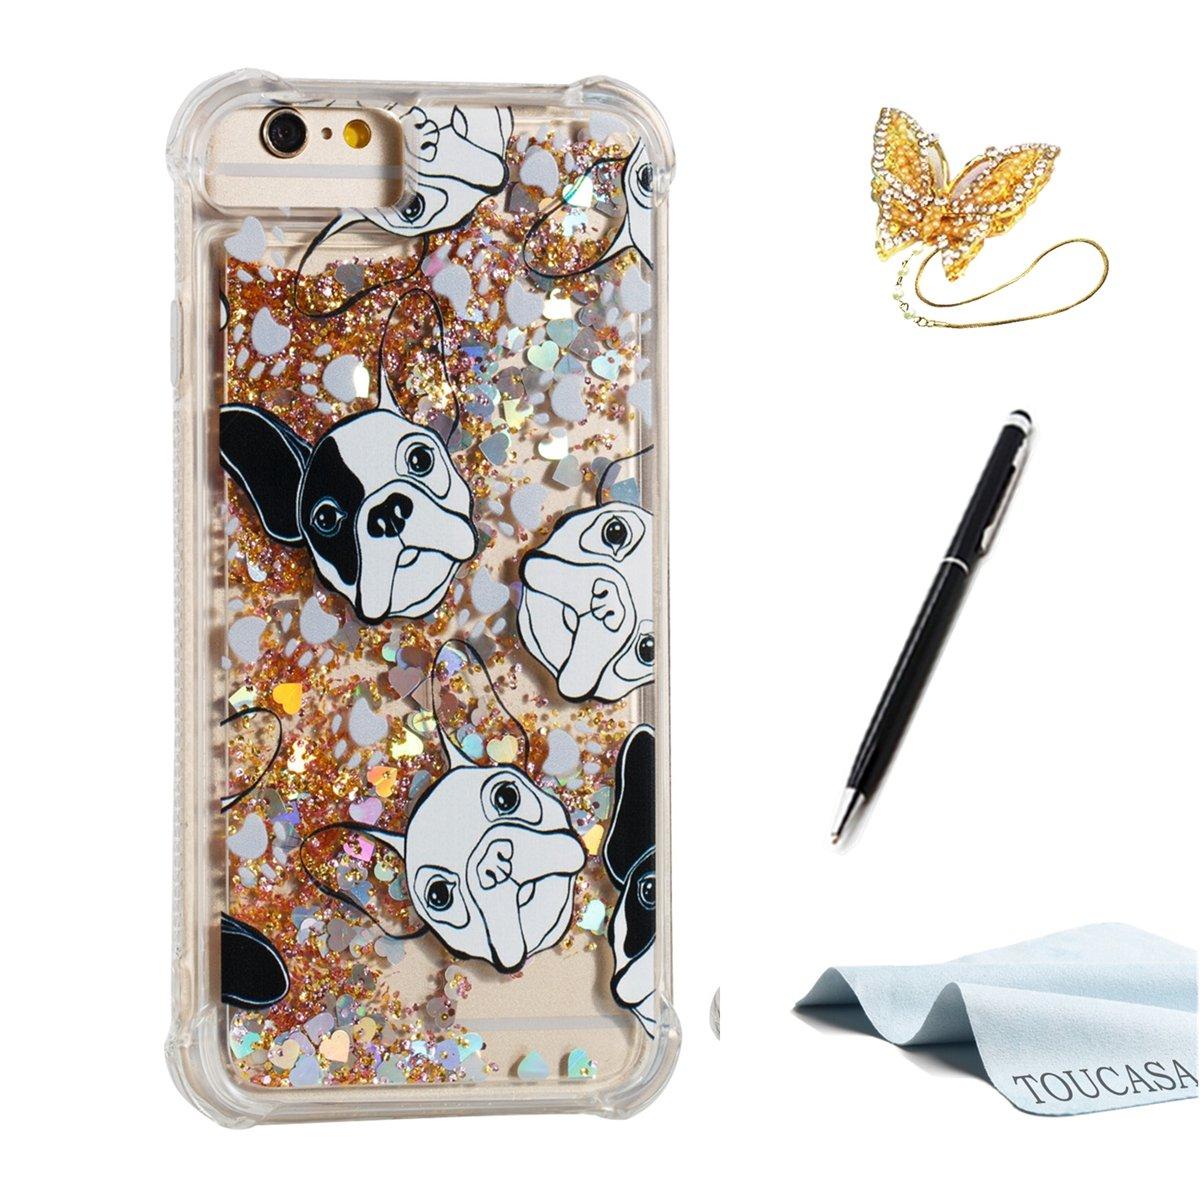 TOUCASA Funda iPhone 6S,Funda iPhone 6, Glitter Brillante Liquida Transparente TPU Silicona,Funda Móvil Case Líquido Quicksand Anti-arañazos Brillante Case ...